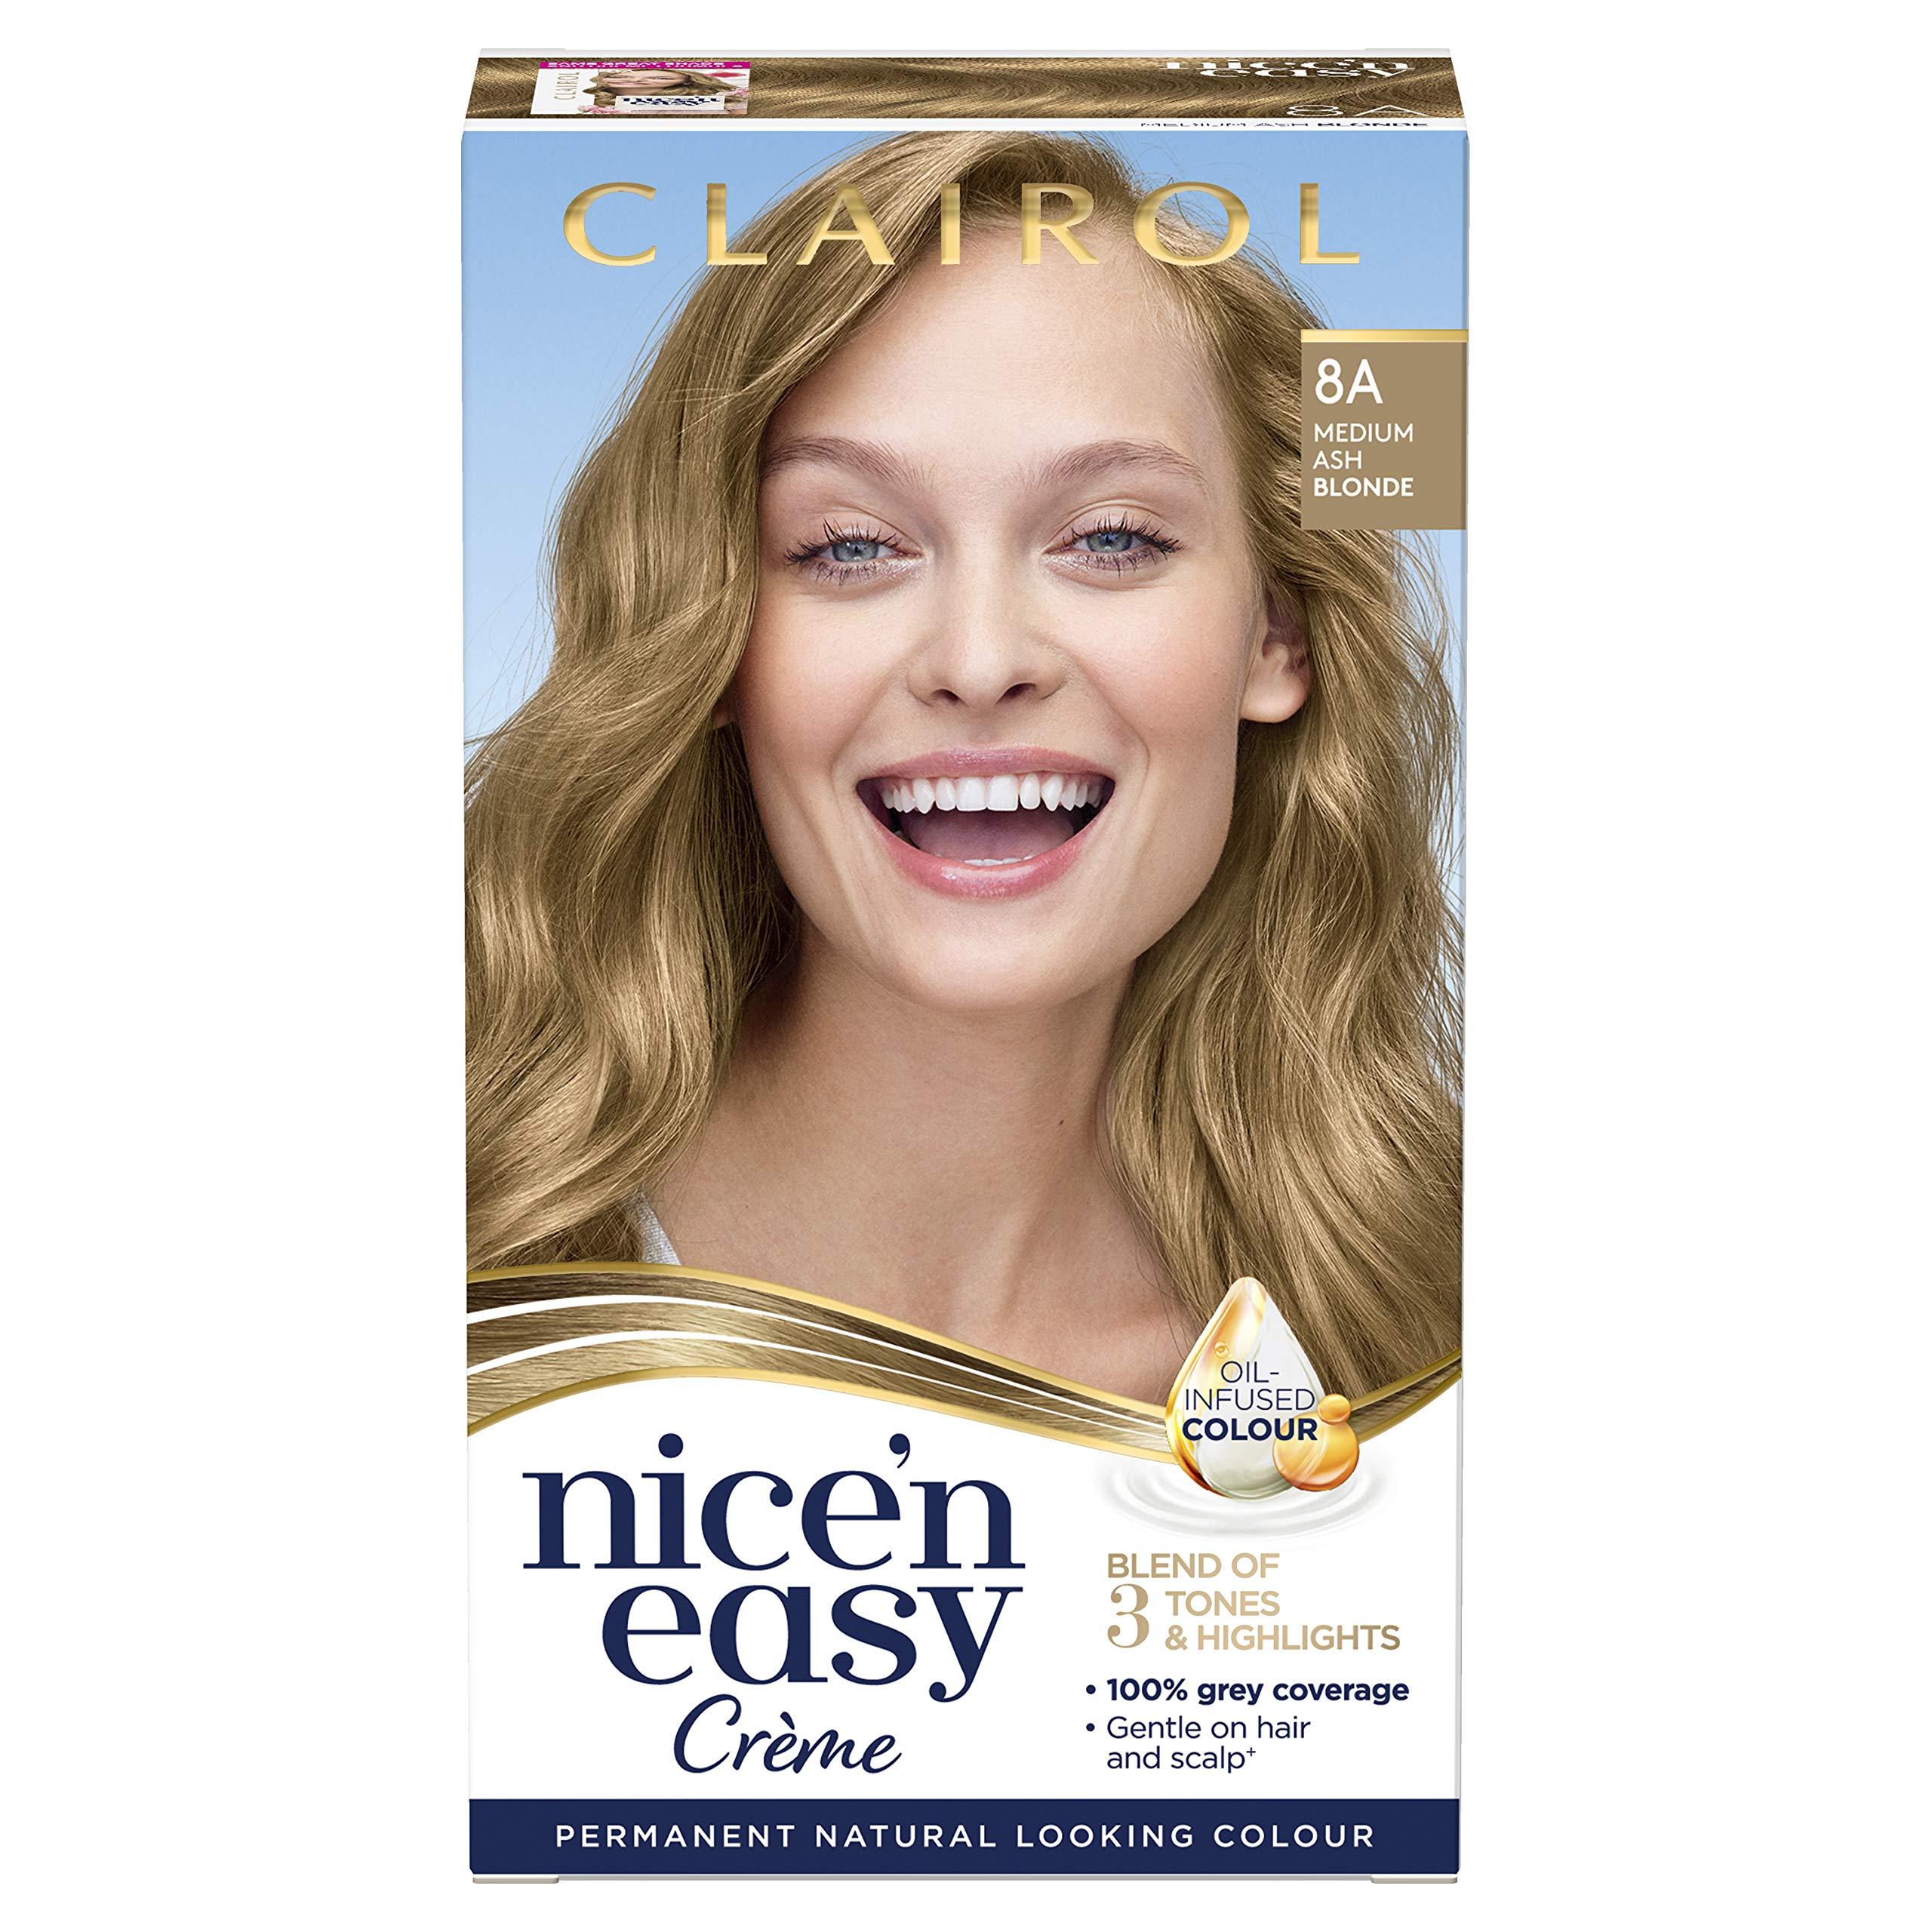 Clairol Nice'n Easy Crème, Natural Looking Oil Infused Permanent Hair Dye, 8A Medium Ash Blonde